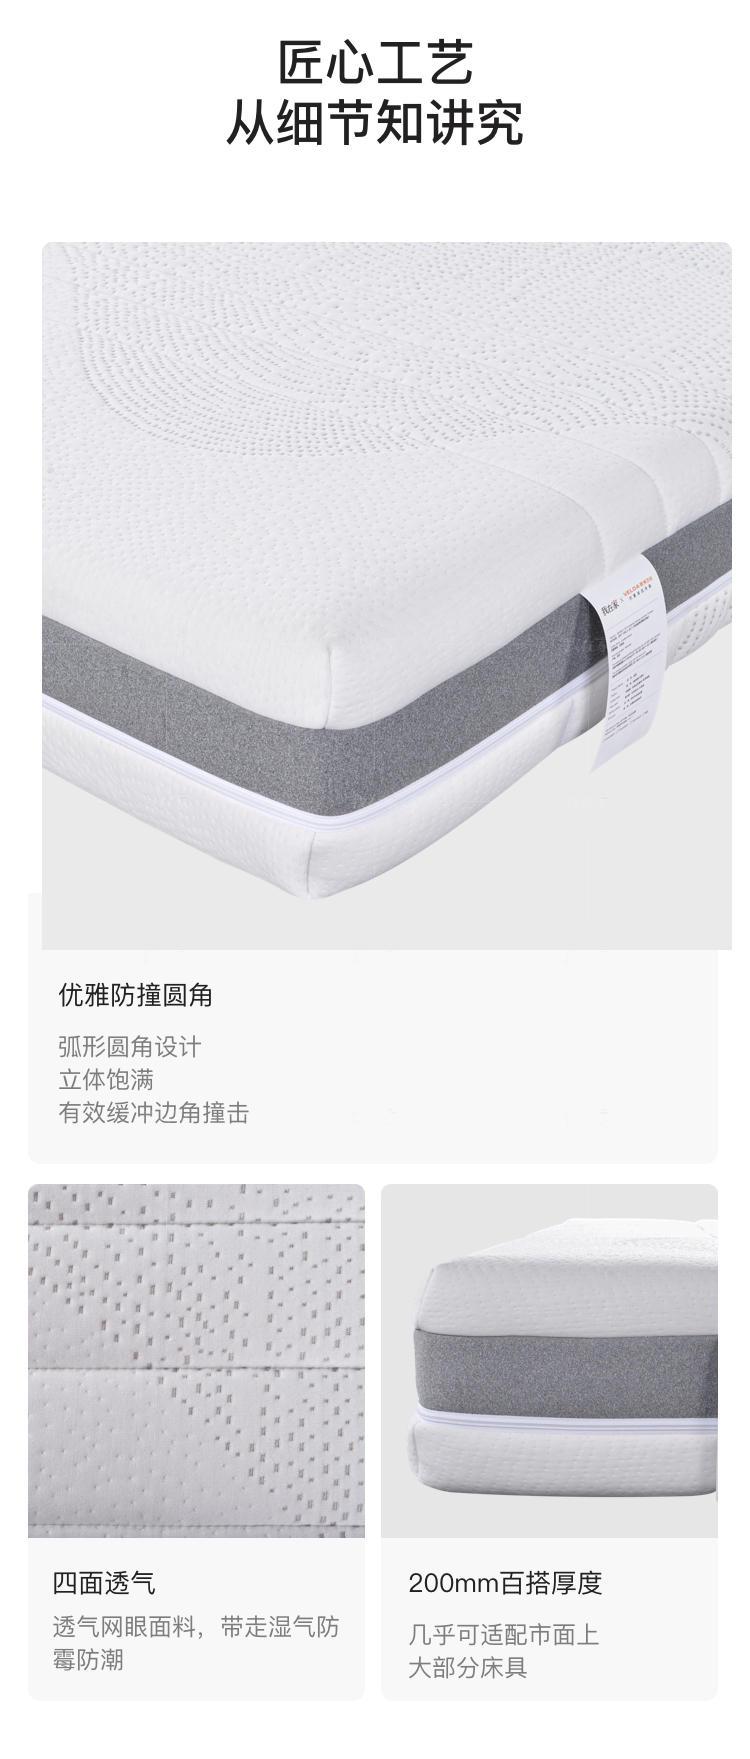 VELDA系列伯恩乳胶床垫的详细介绍